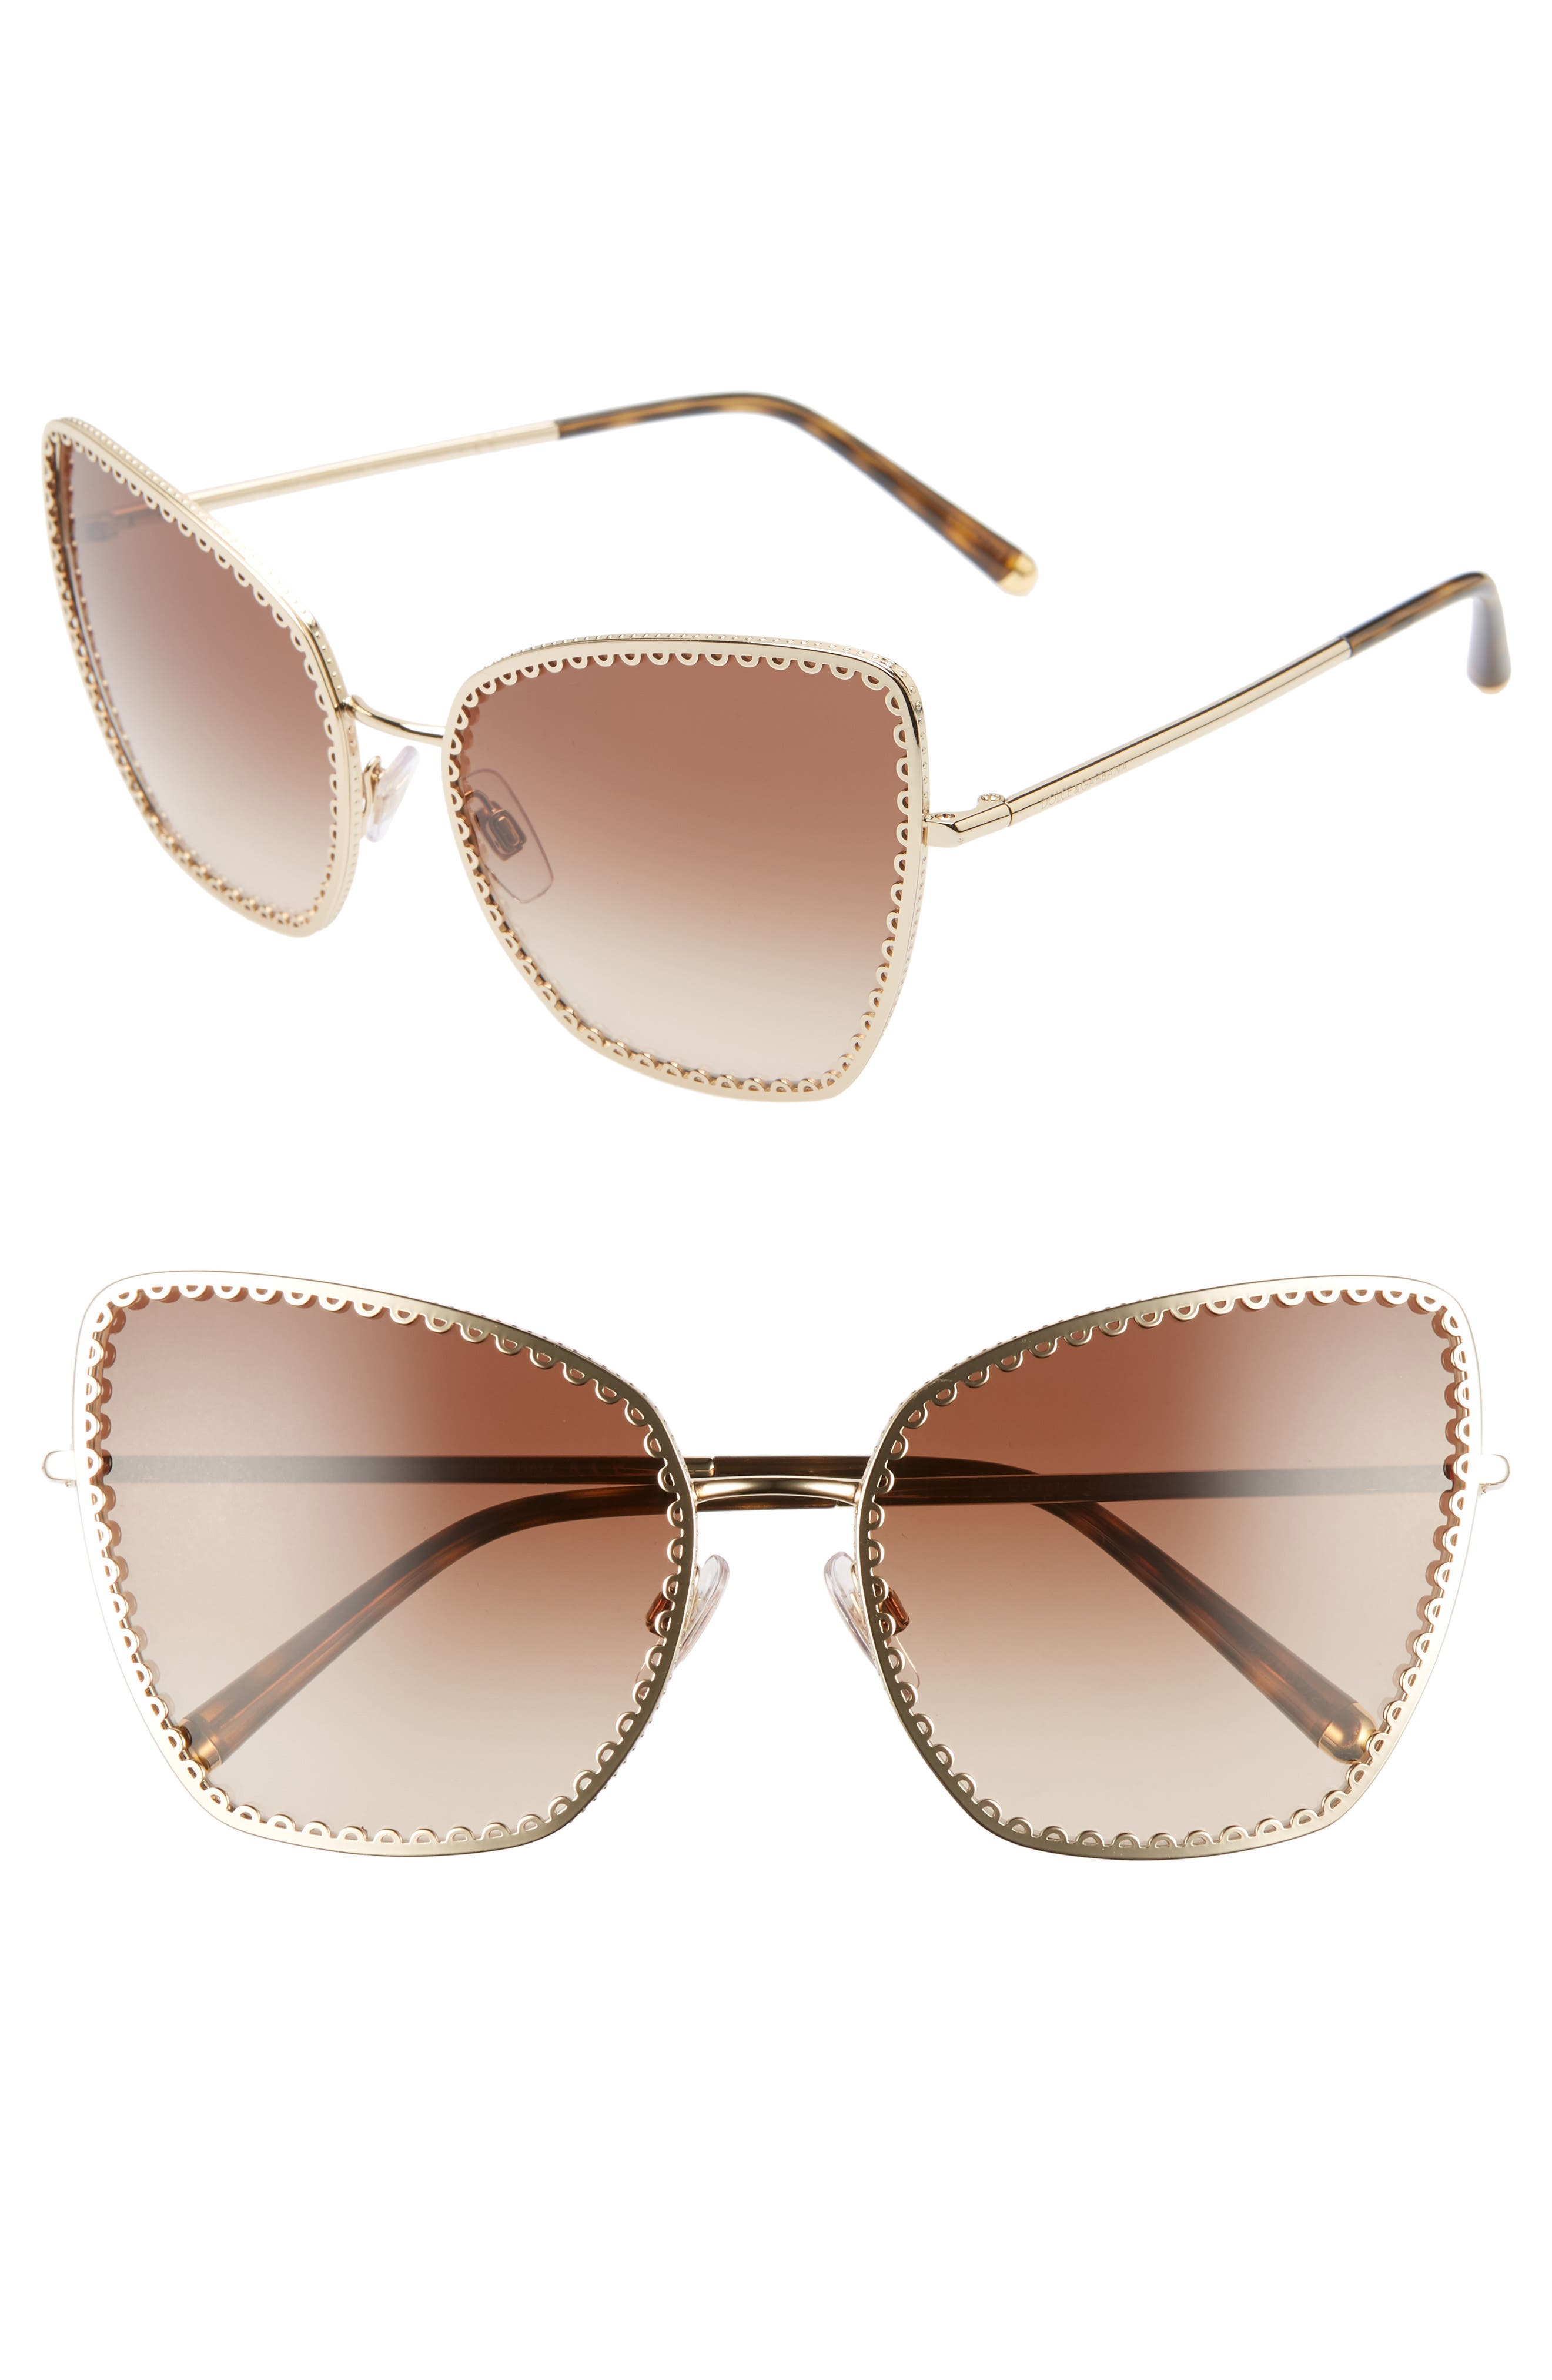 Sacred Heart 61mm Gradient Cat Eye Sunglasses,                             Main thumbnail 1, color,                             GOLD GRADIENT